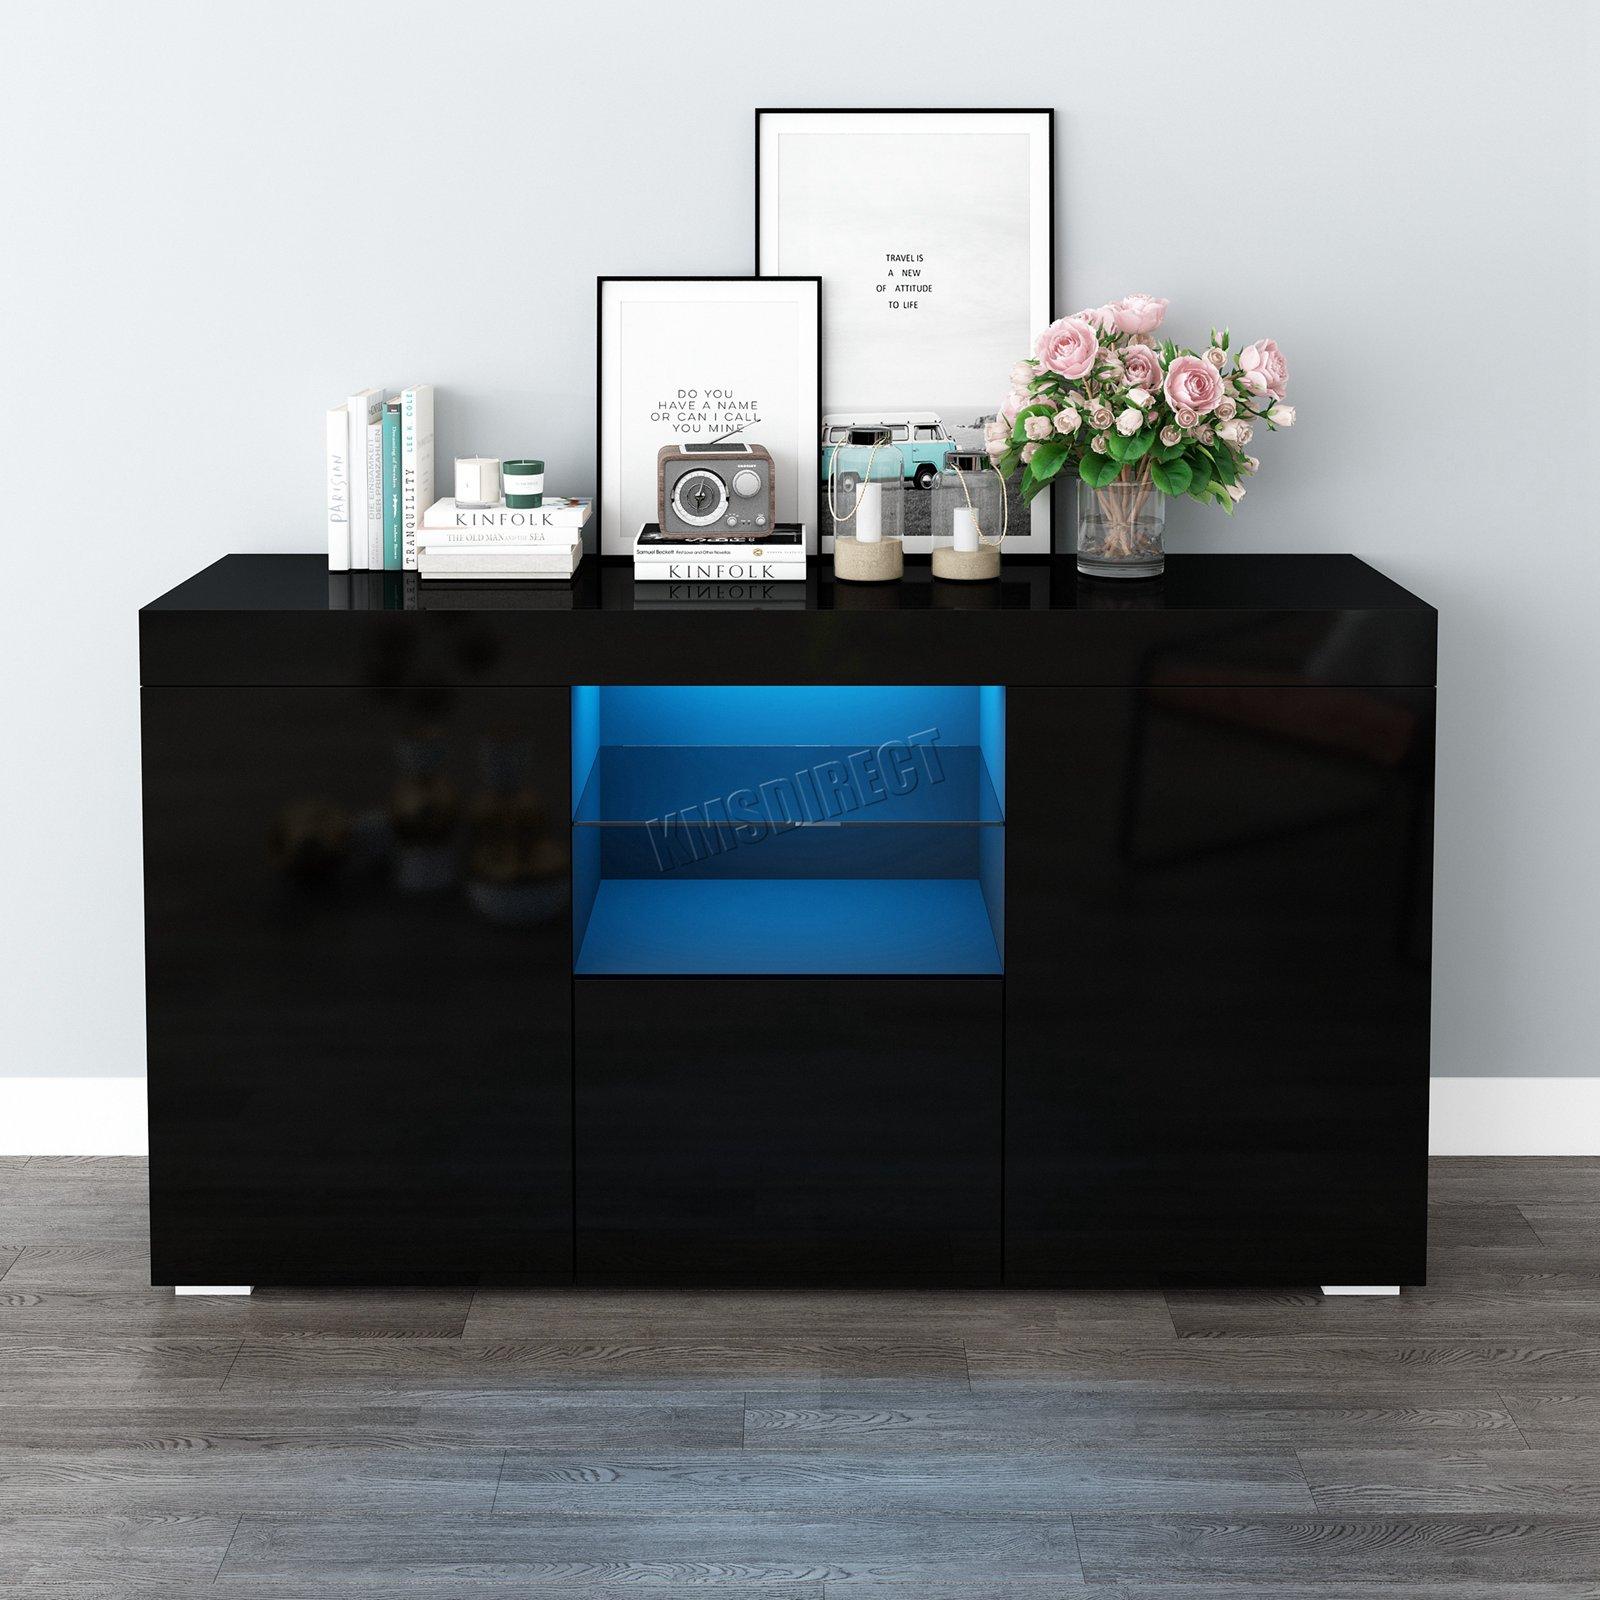 WestWood-PB-High-Gloss-Cabinet-LED-Bookshelf-Sideboard-Cupboard-Home-Unit-PHC03 thumbnail 14